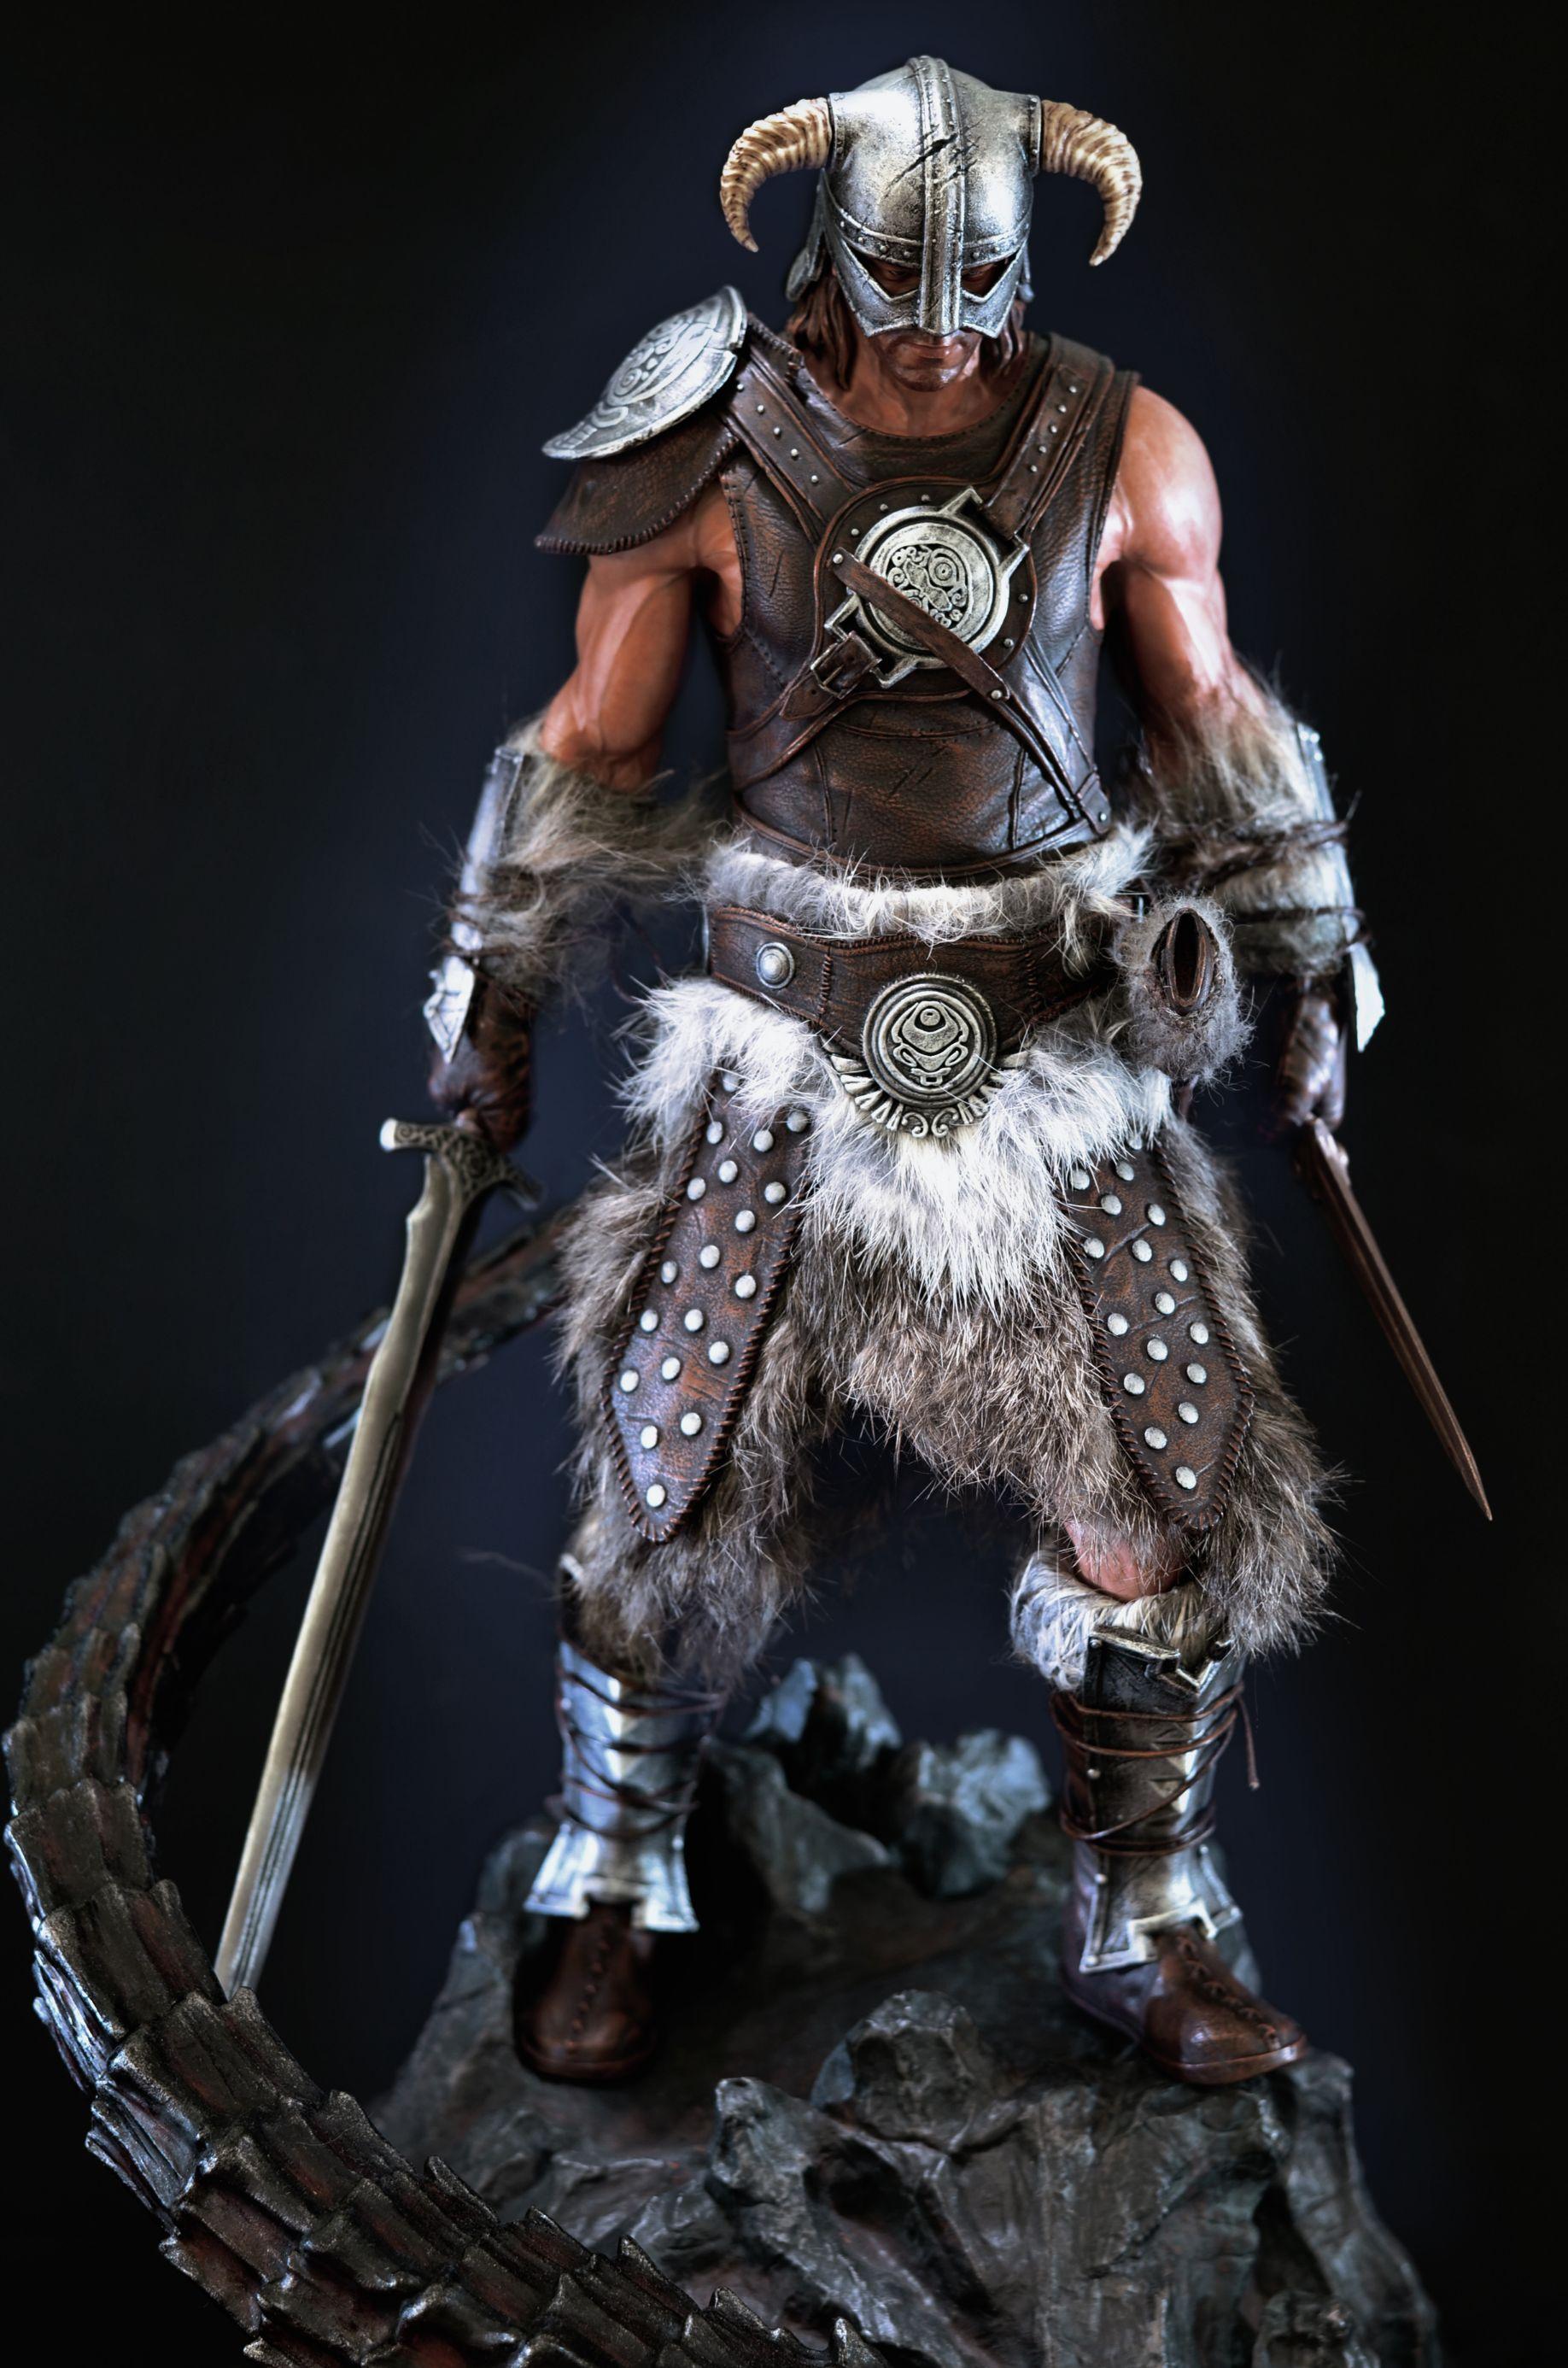 [WIP] [Self] Dragonborn Armor Piece StepByStep cosplay